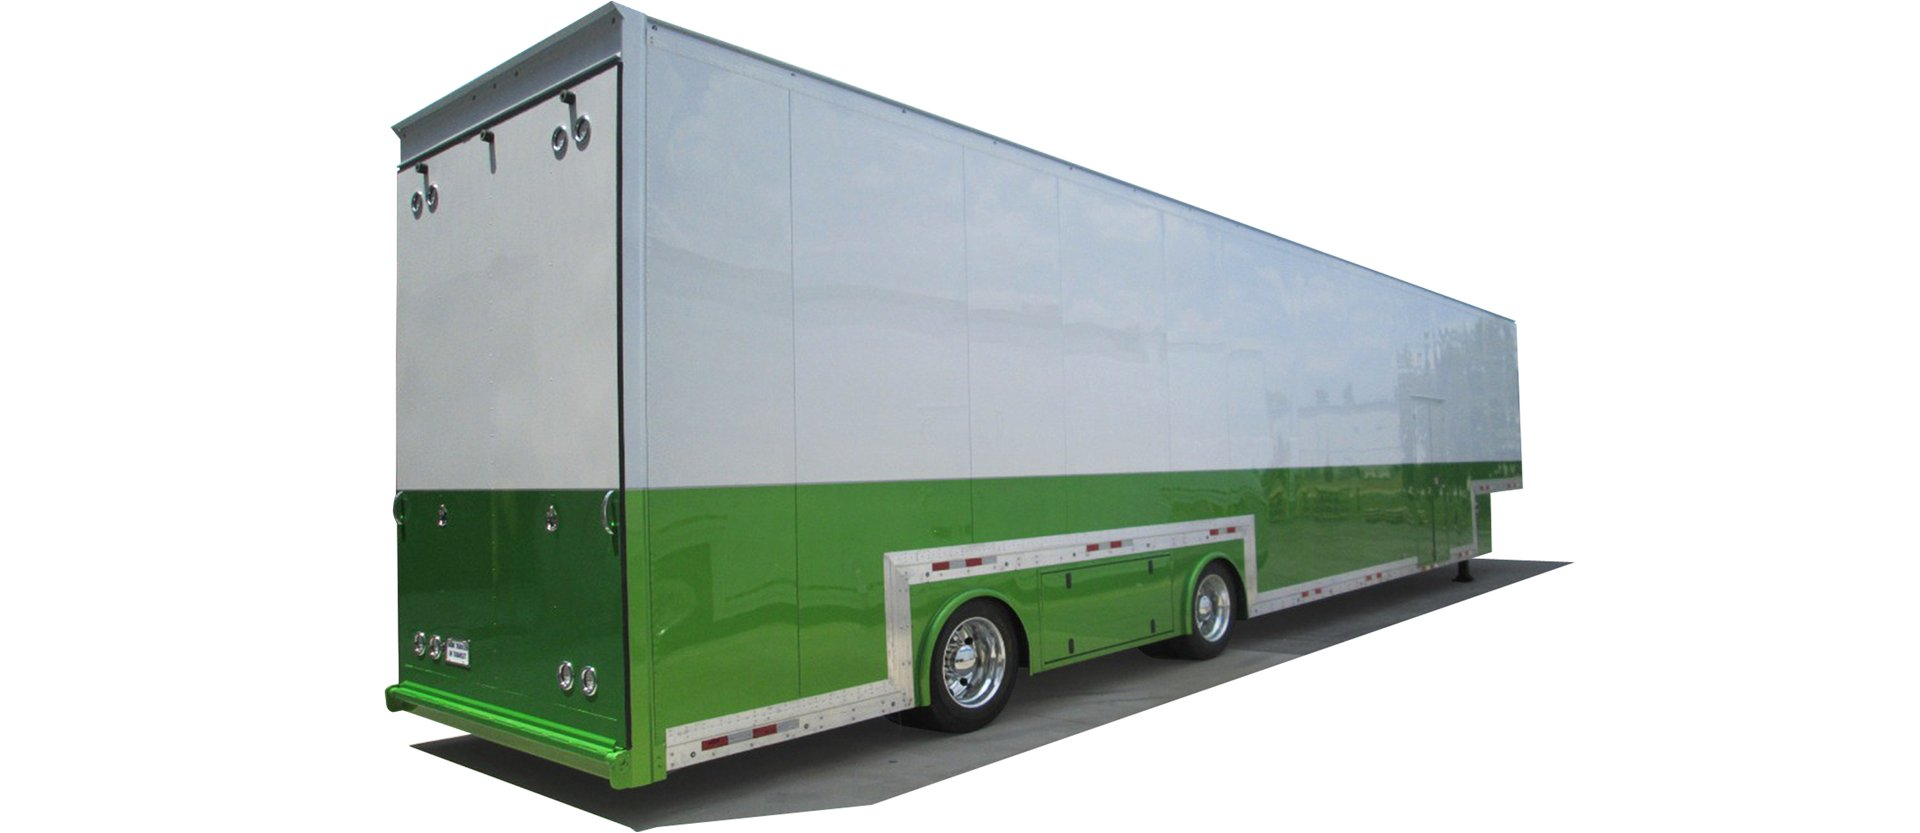 Pro Pulling & Monster Truck | Motorsports | Specialty